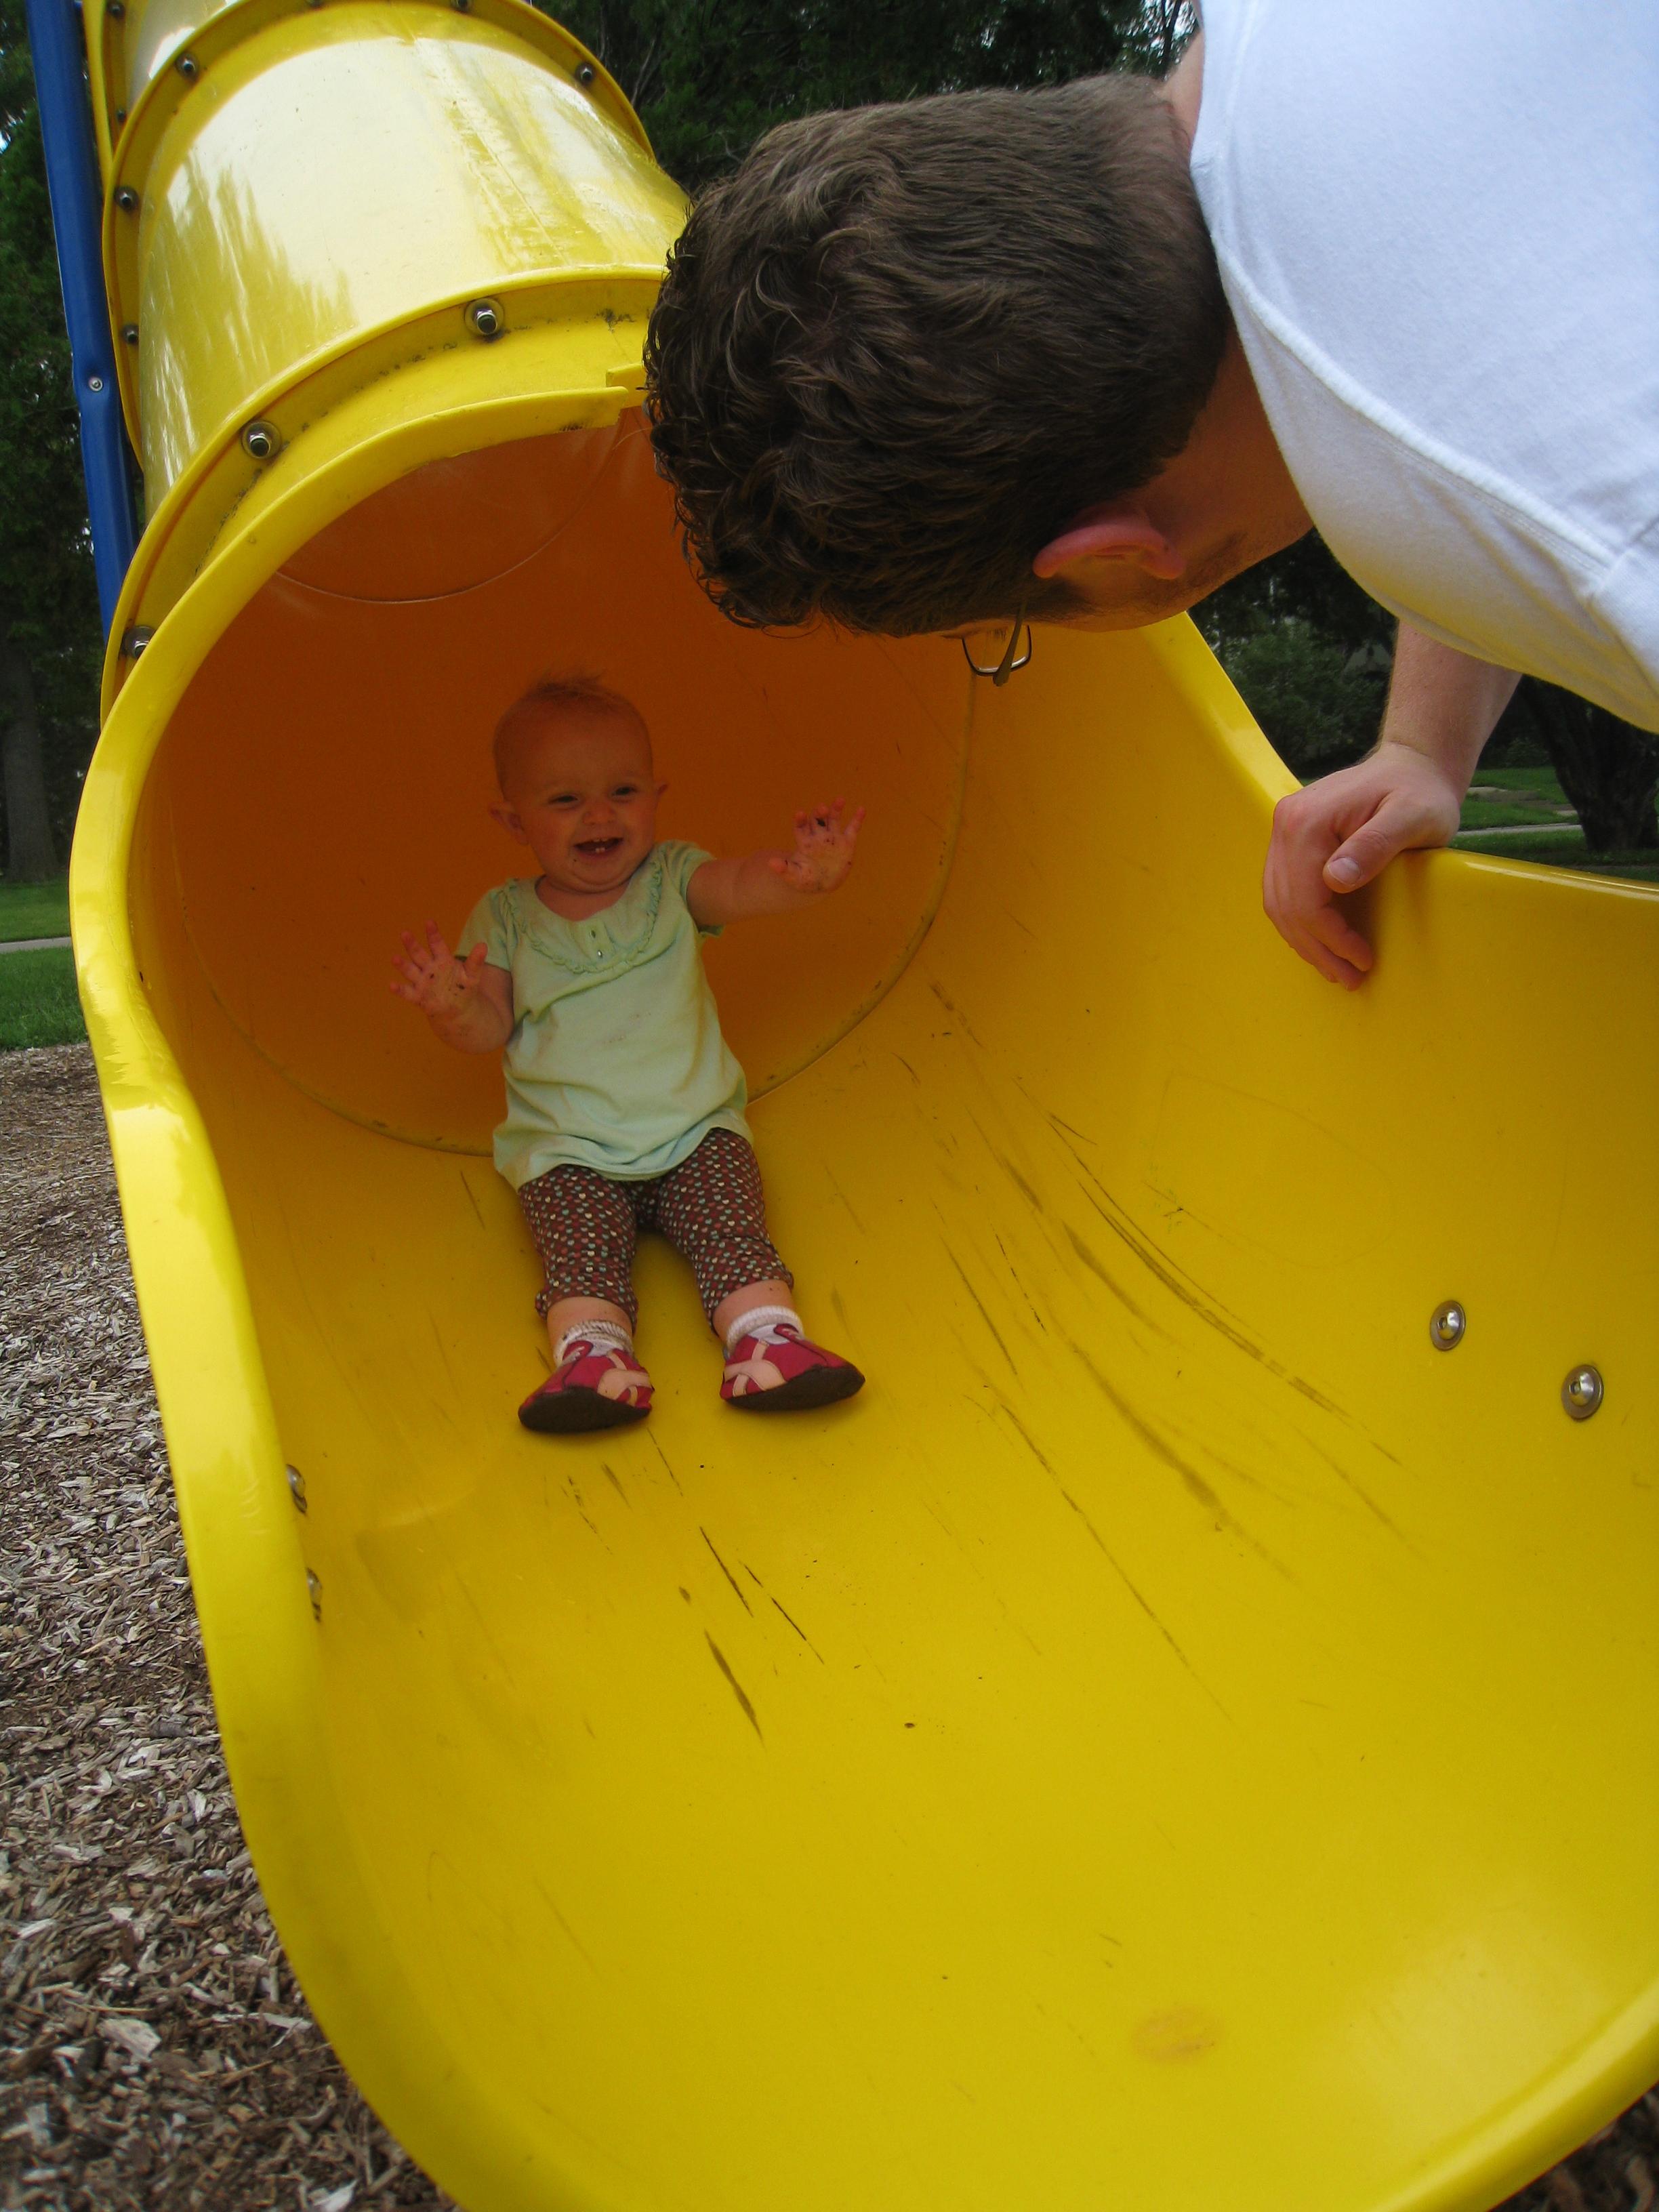 kivrin happy on the slide